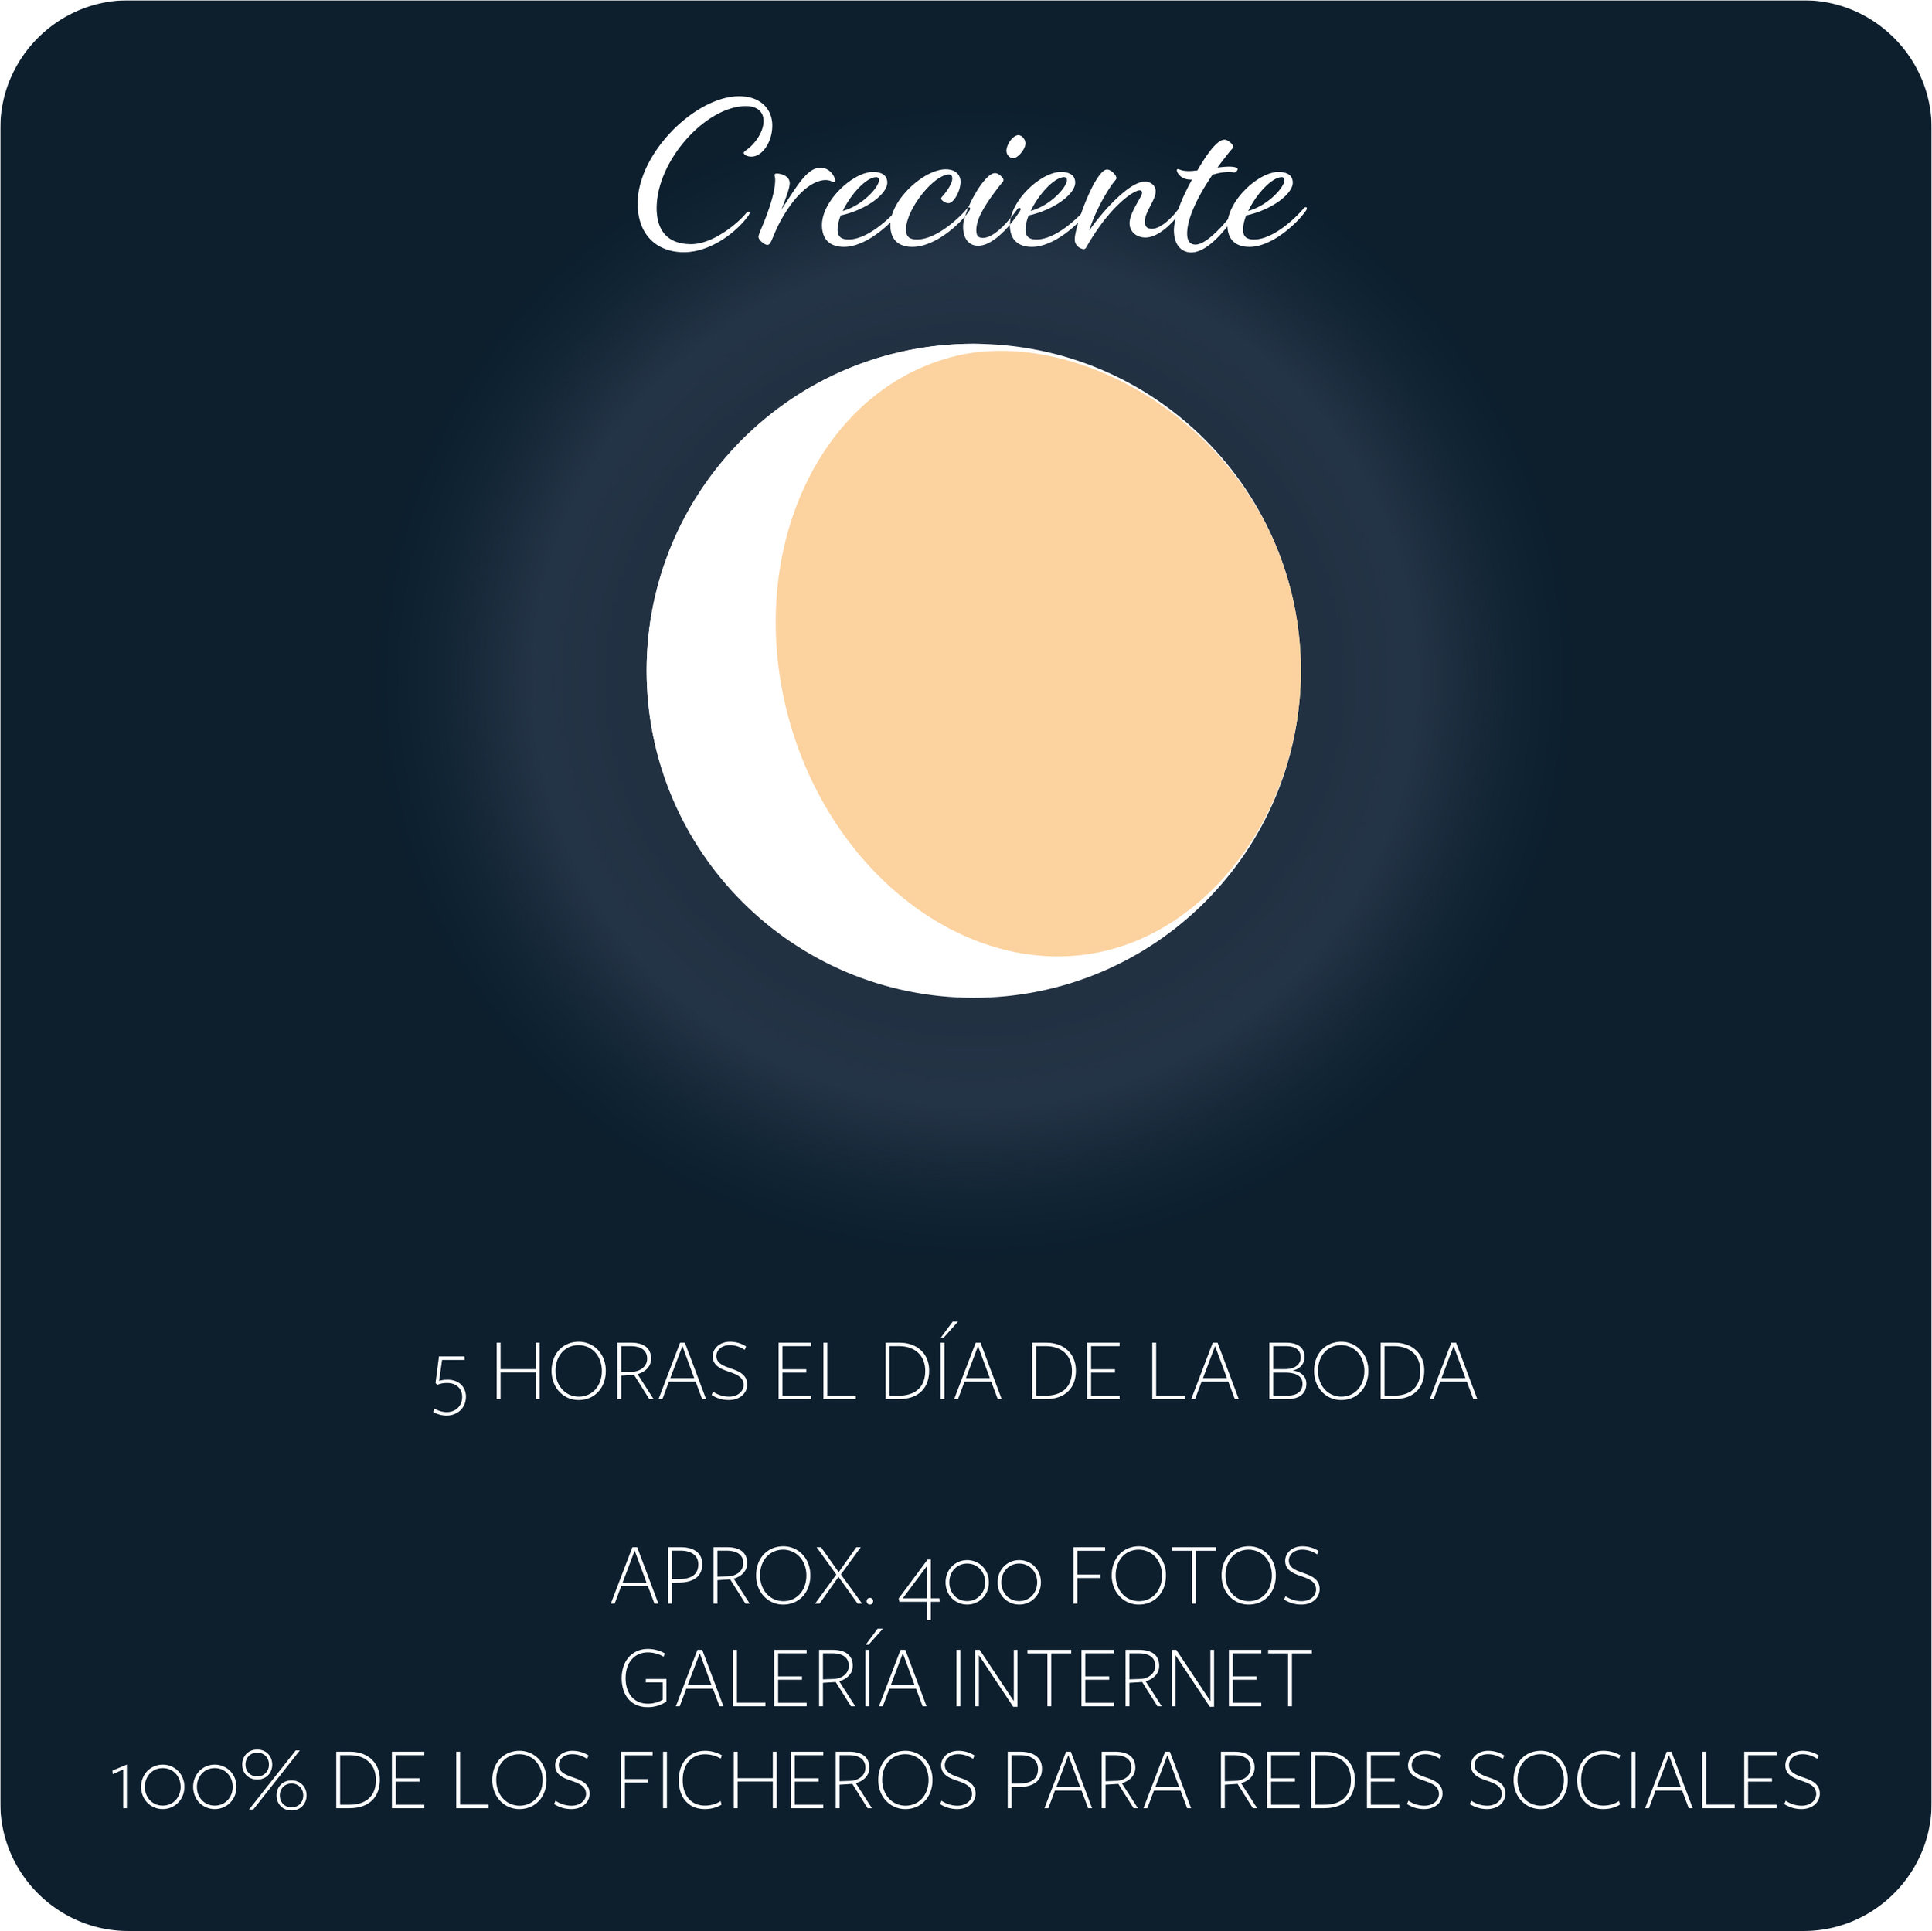 croissant-lune-fmttm.jpg